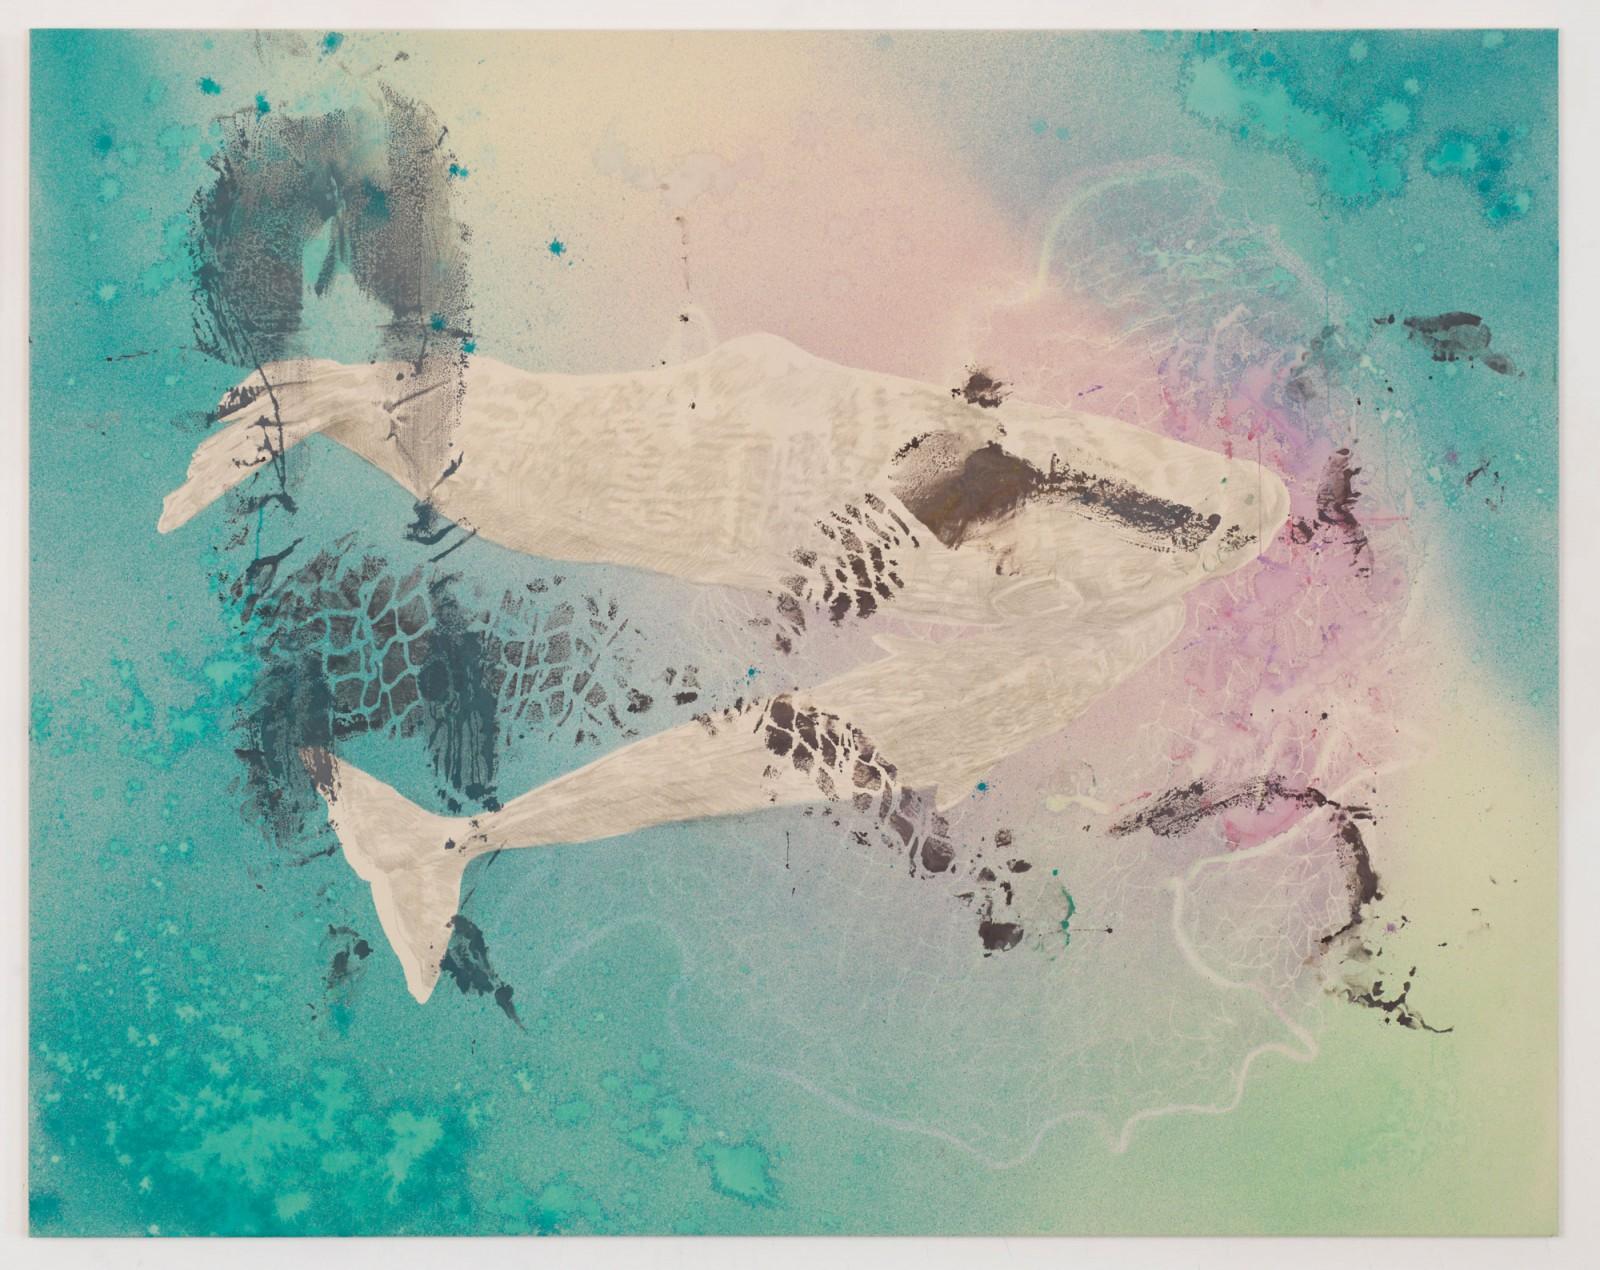 Kim Nekarda: untitled, 2016, vinyl color, pencil & body print on cotton, 140 x 180 cm